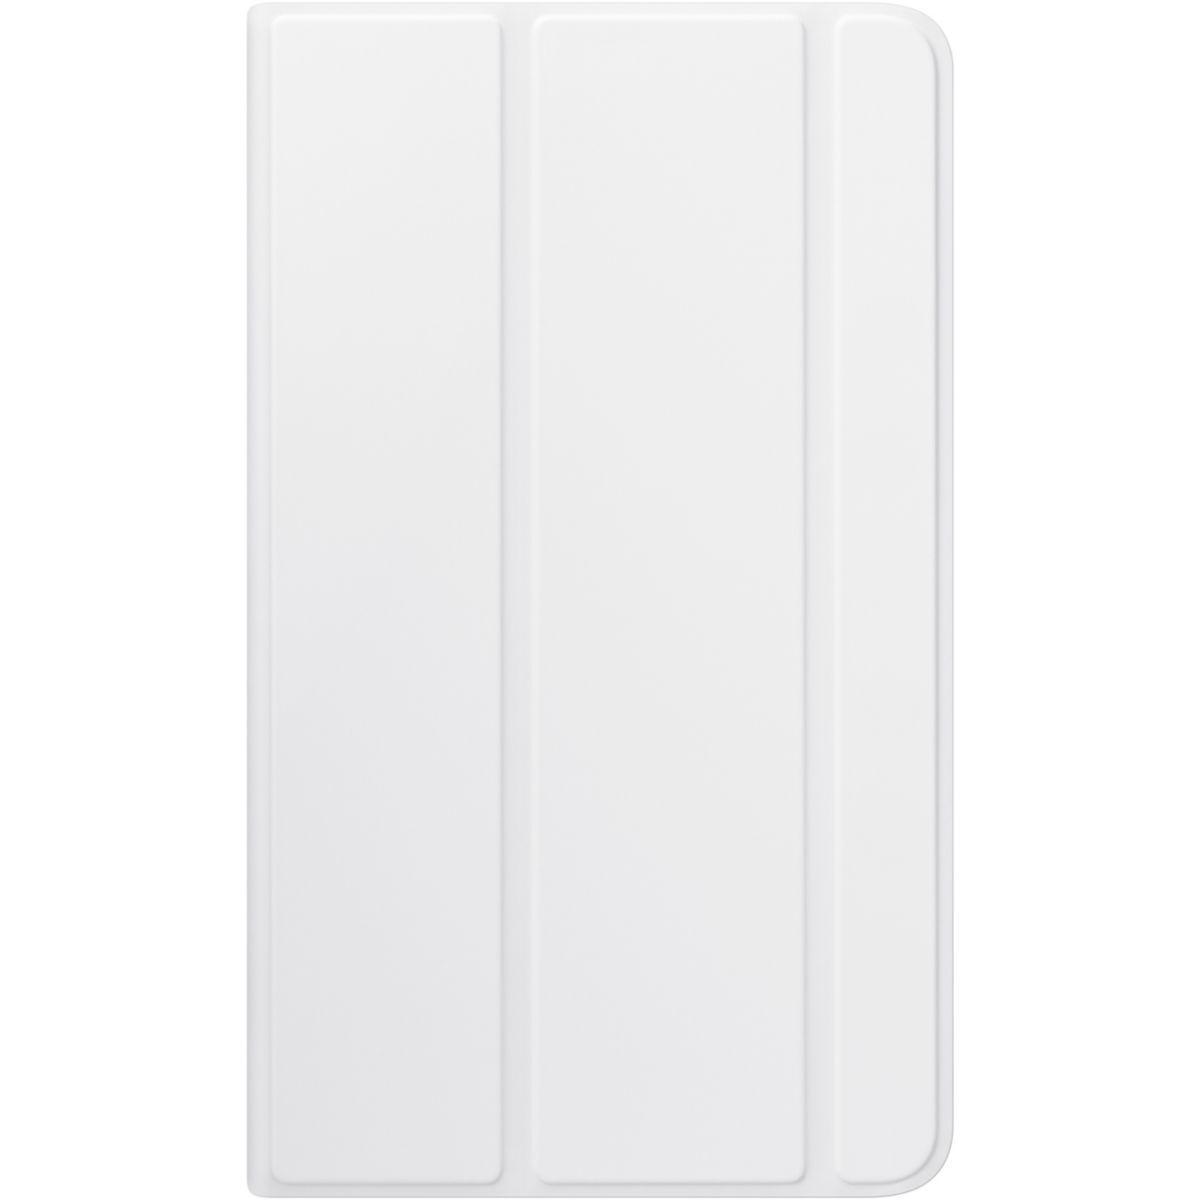 Etui tablette samsung book cover tab a 6 7'' blanc - livraison offerte : code liv (photo)